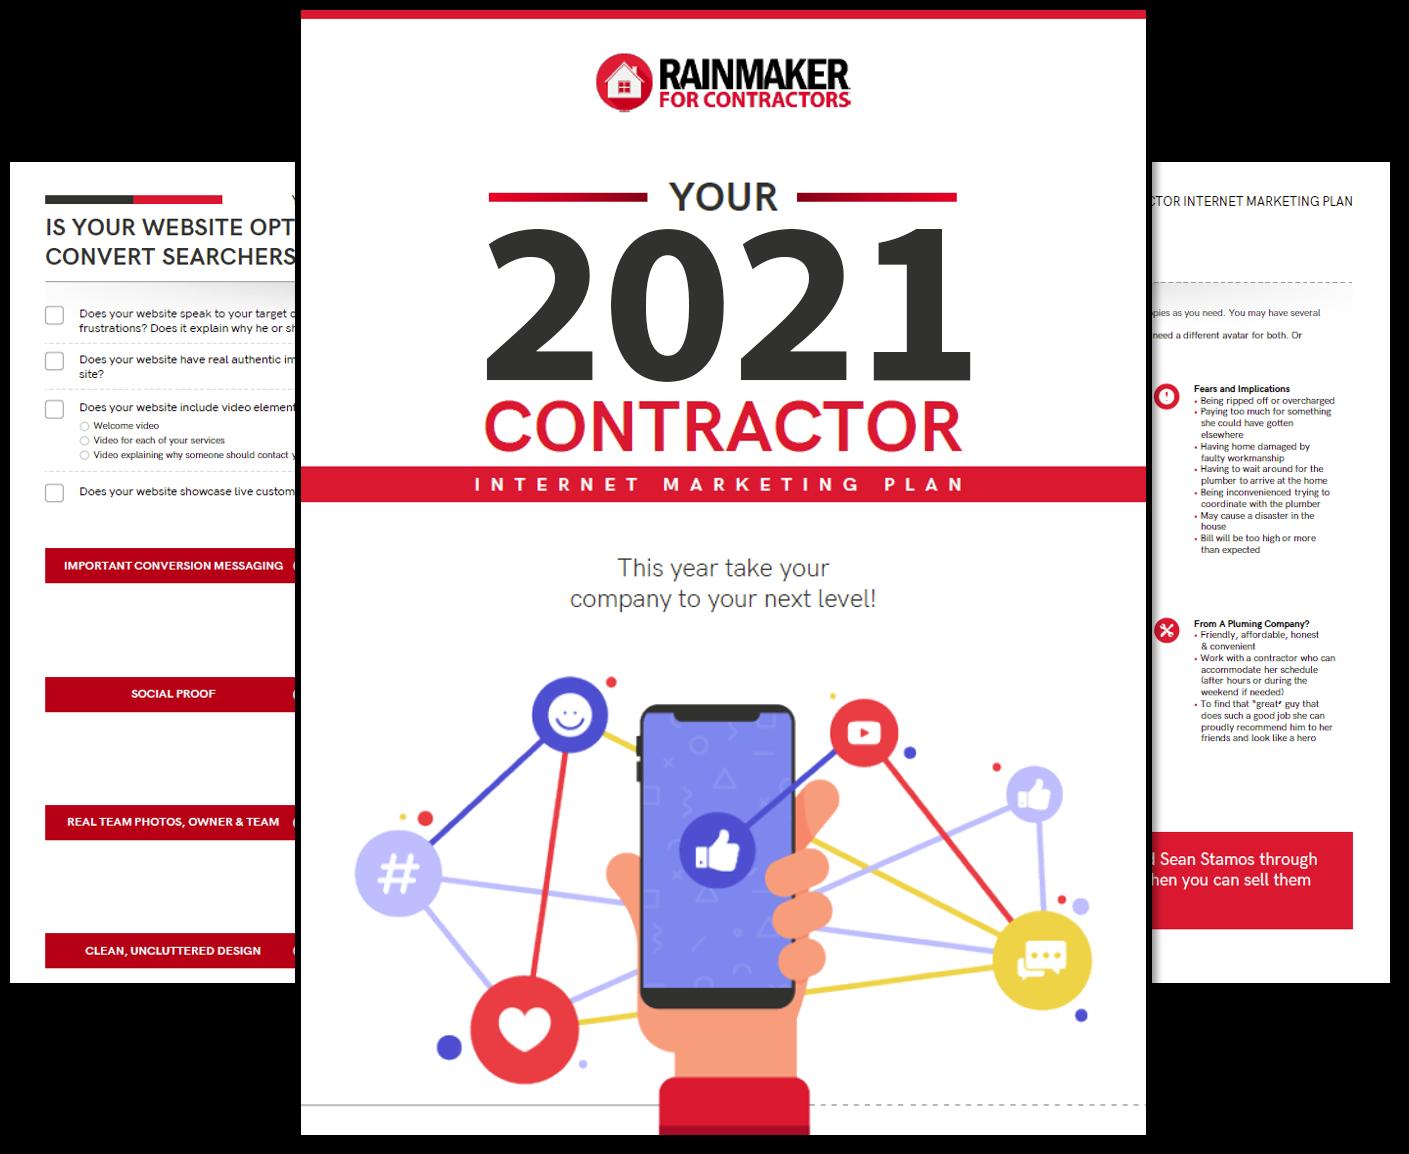 rainmaker-for-contractors-marketing-plan-image 2021